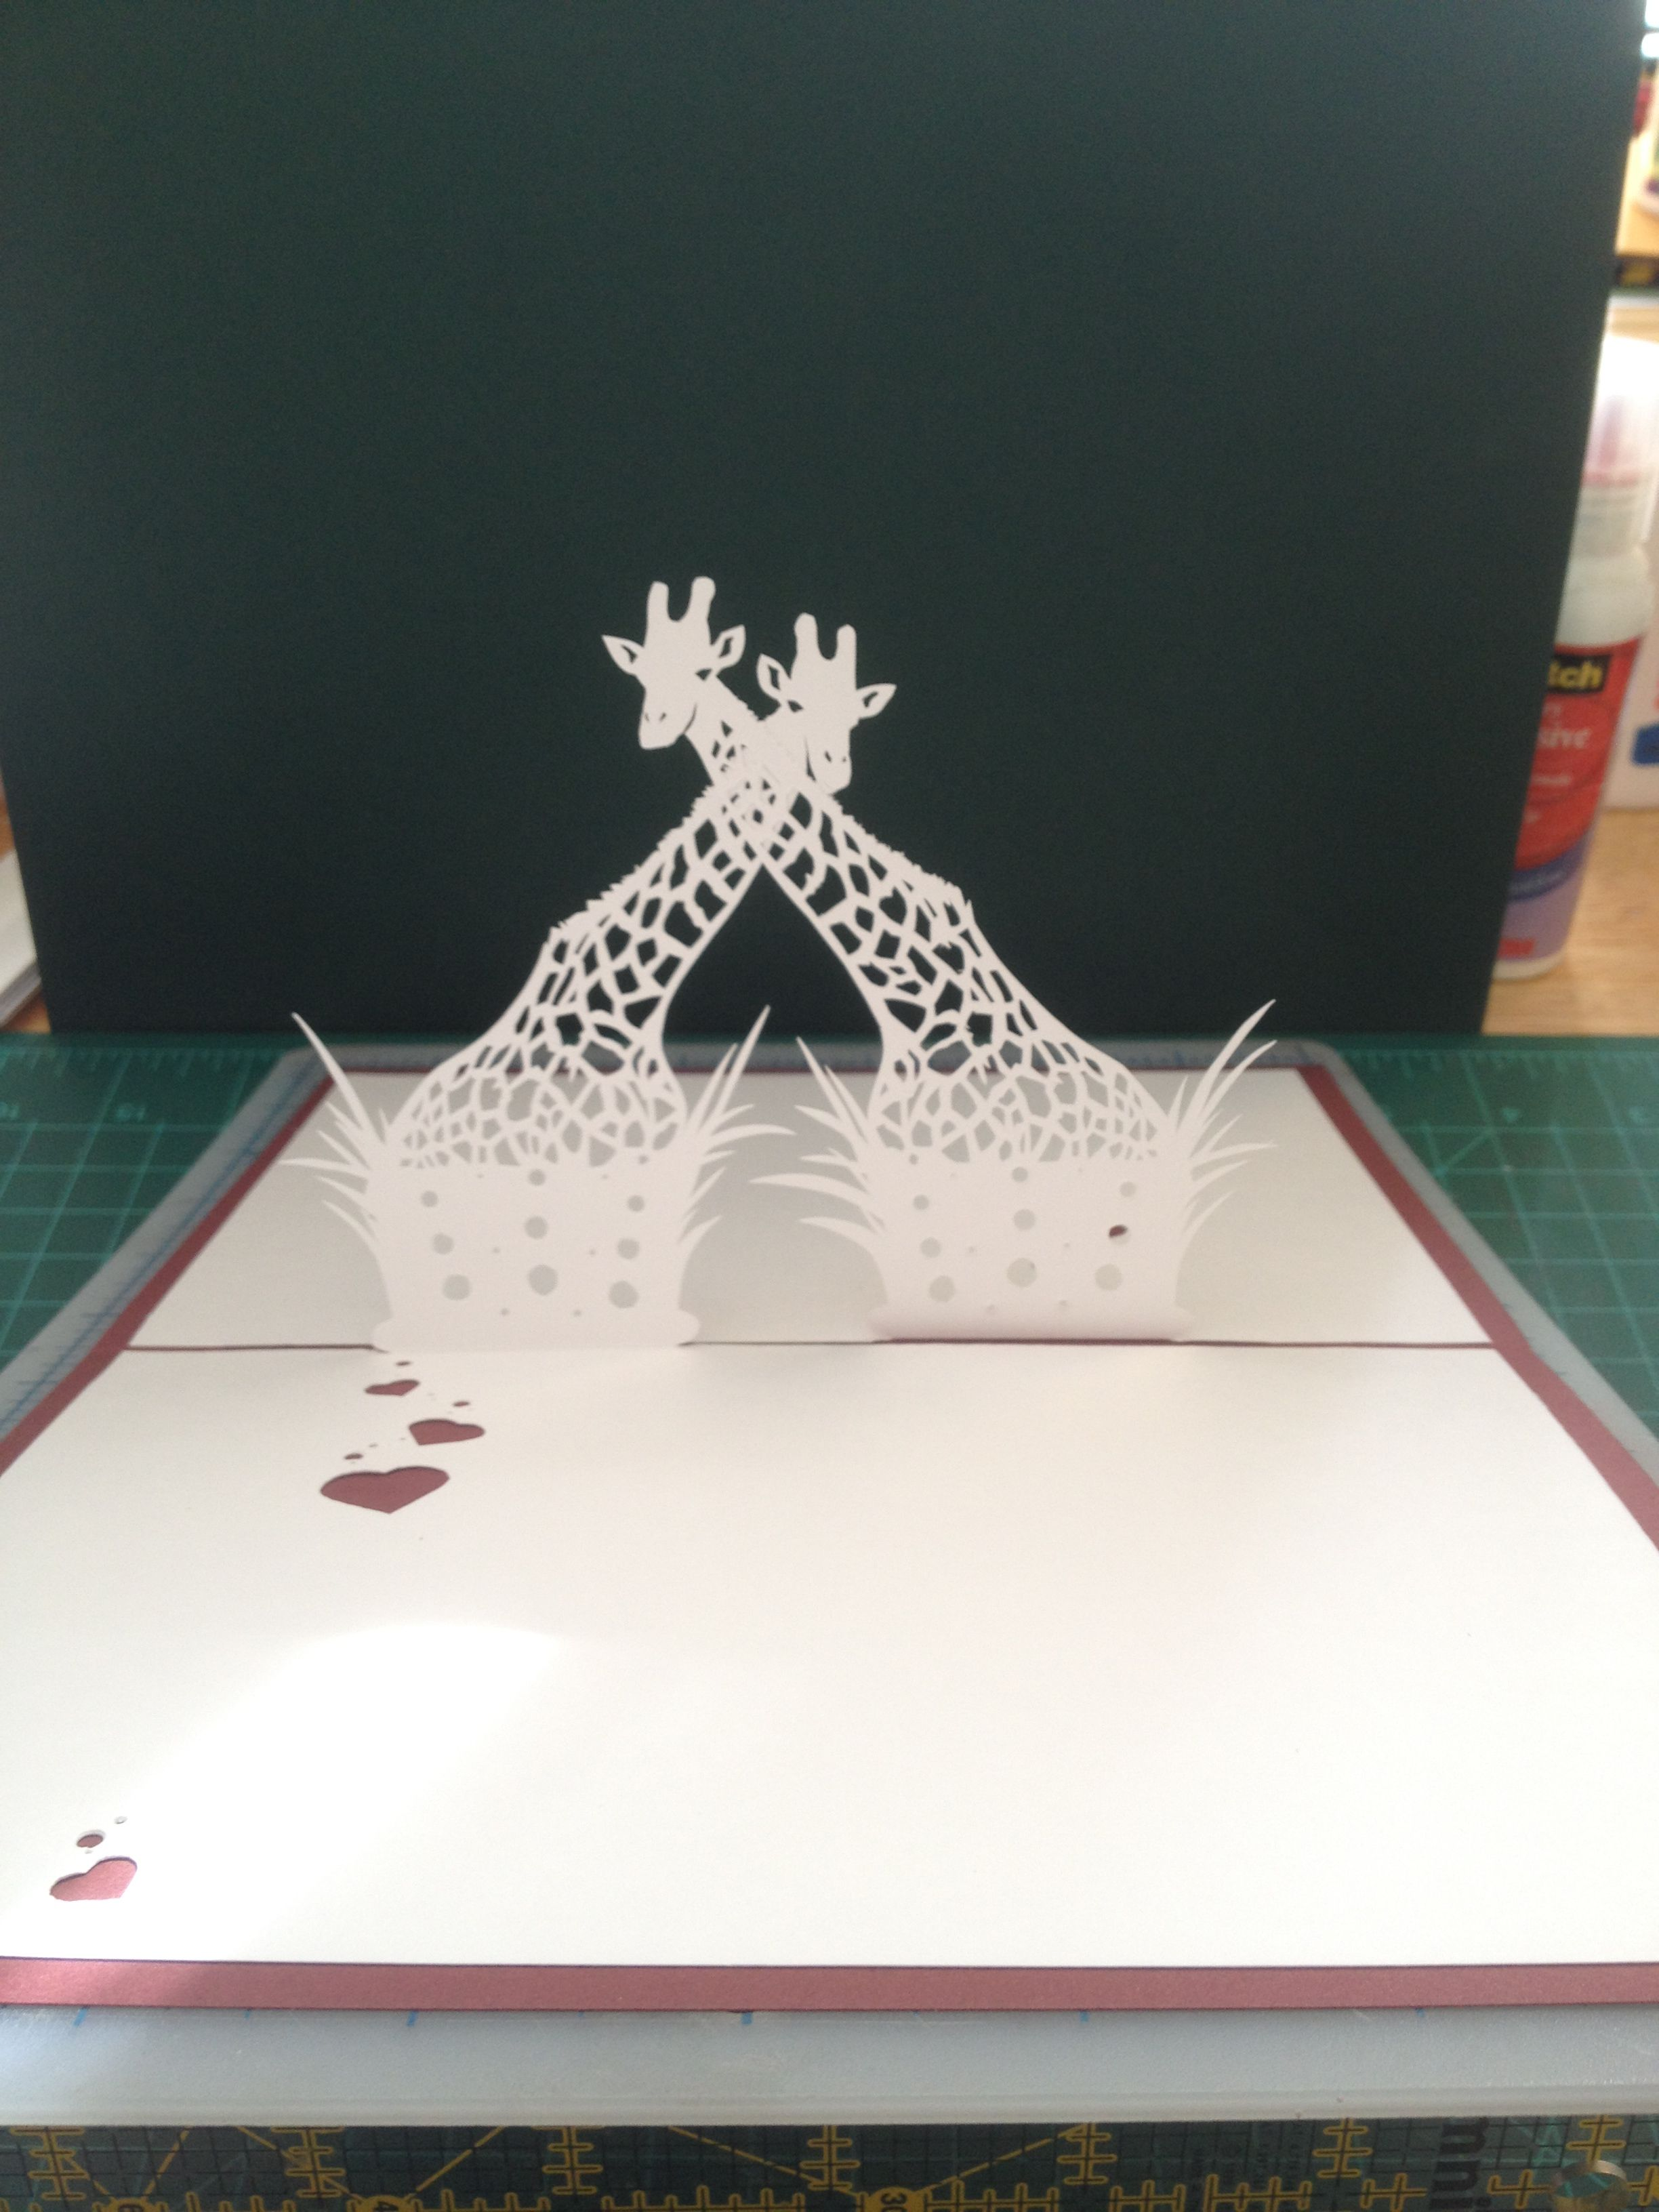 Giraffe Pair Pop Up Card Template From Cahier Kirigami Harmonies Couleurs Kirigami Patterns Pop Up Card Templates Kirigami